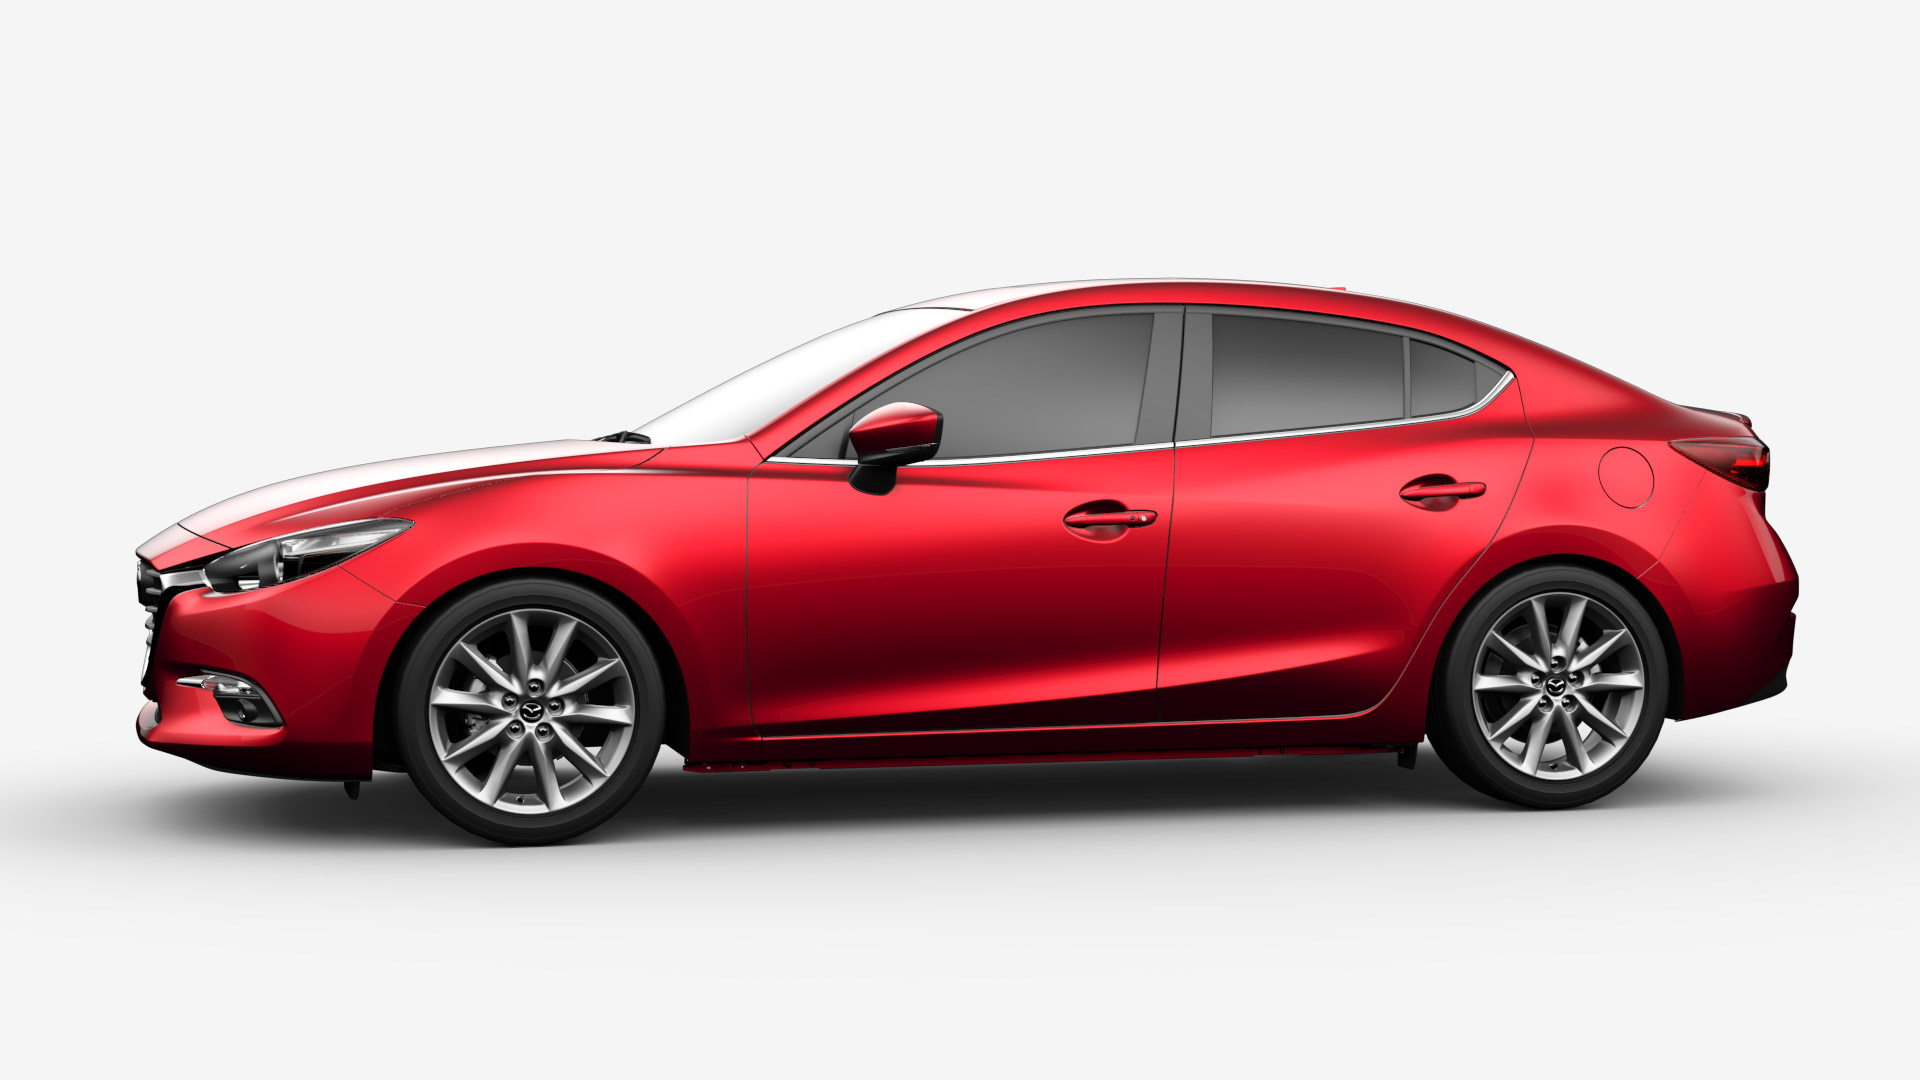 2017 Mazda 3 Sedan - Fuel Efficient Compact Car | Mazda USA